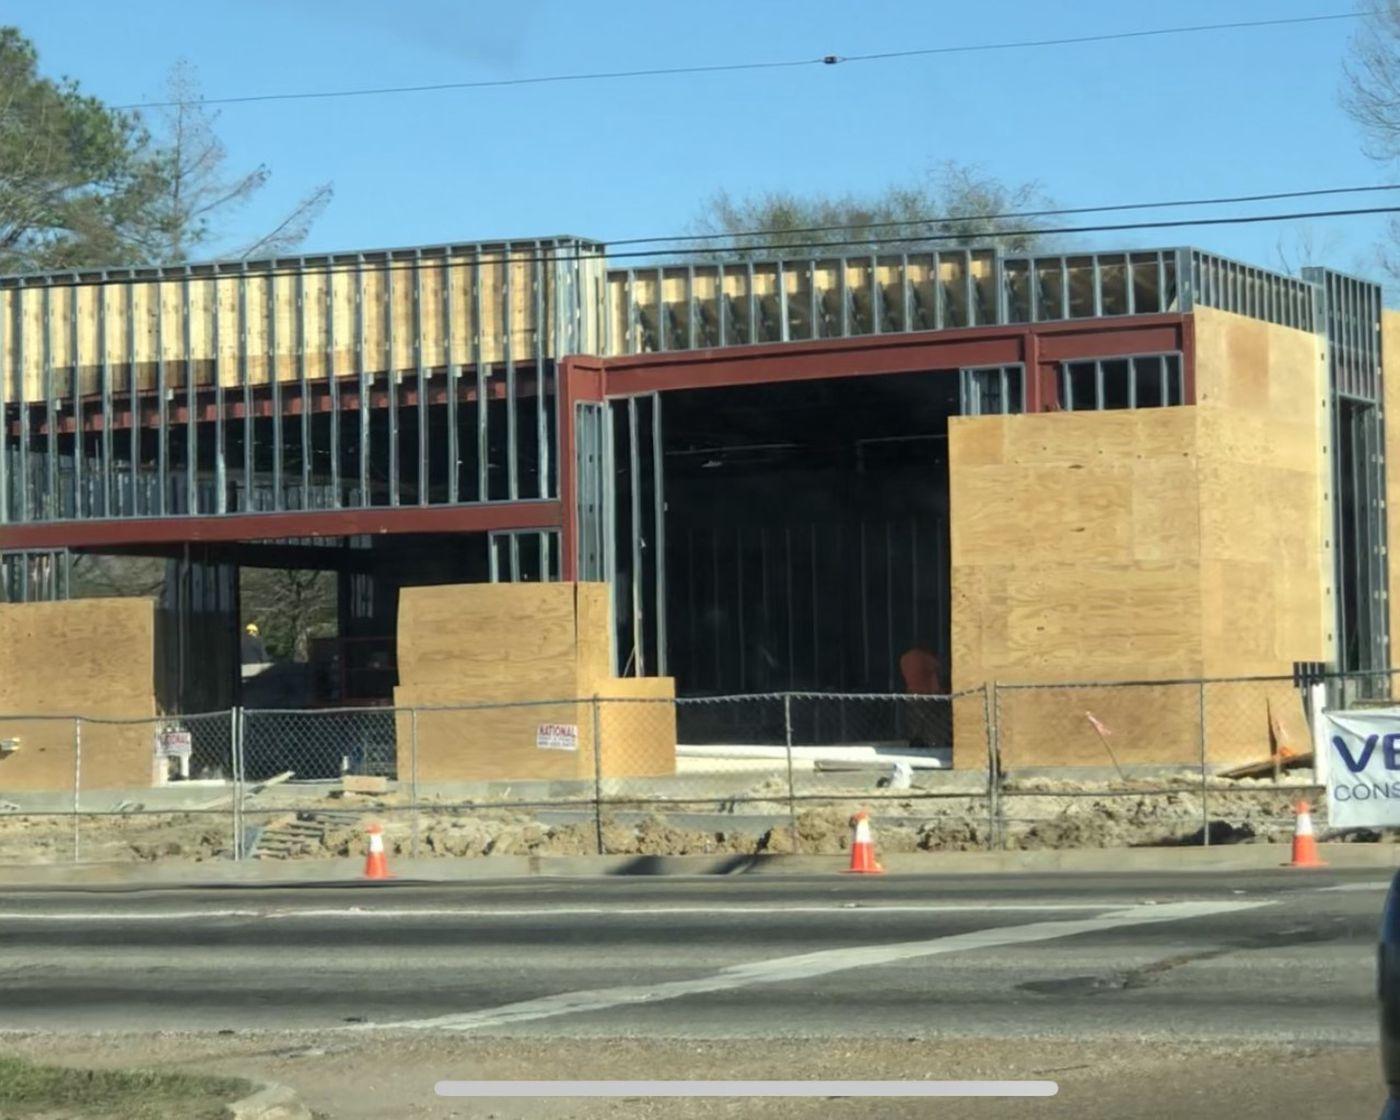 Renovations are underway at the Krispy Kreme on Plank Road in Baton Rouge.